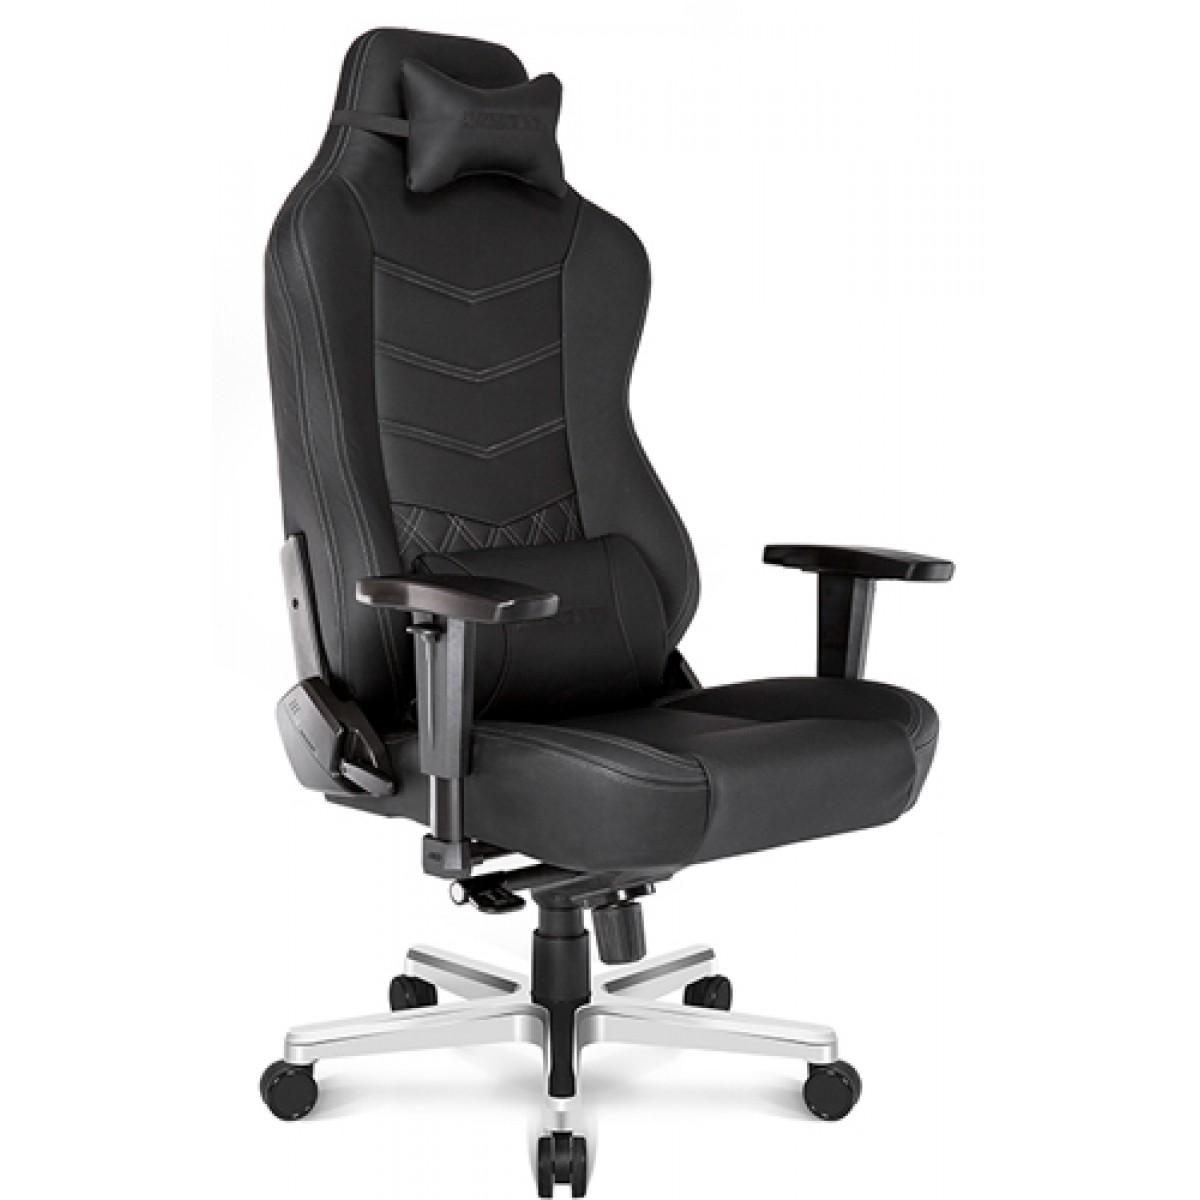 Cadeira Gamer AKRacing, Onyx, Reclinável, Preta, AK-ONYX-BK